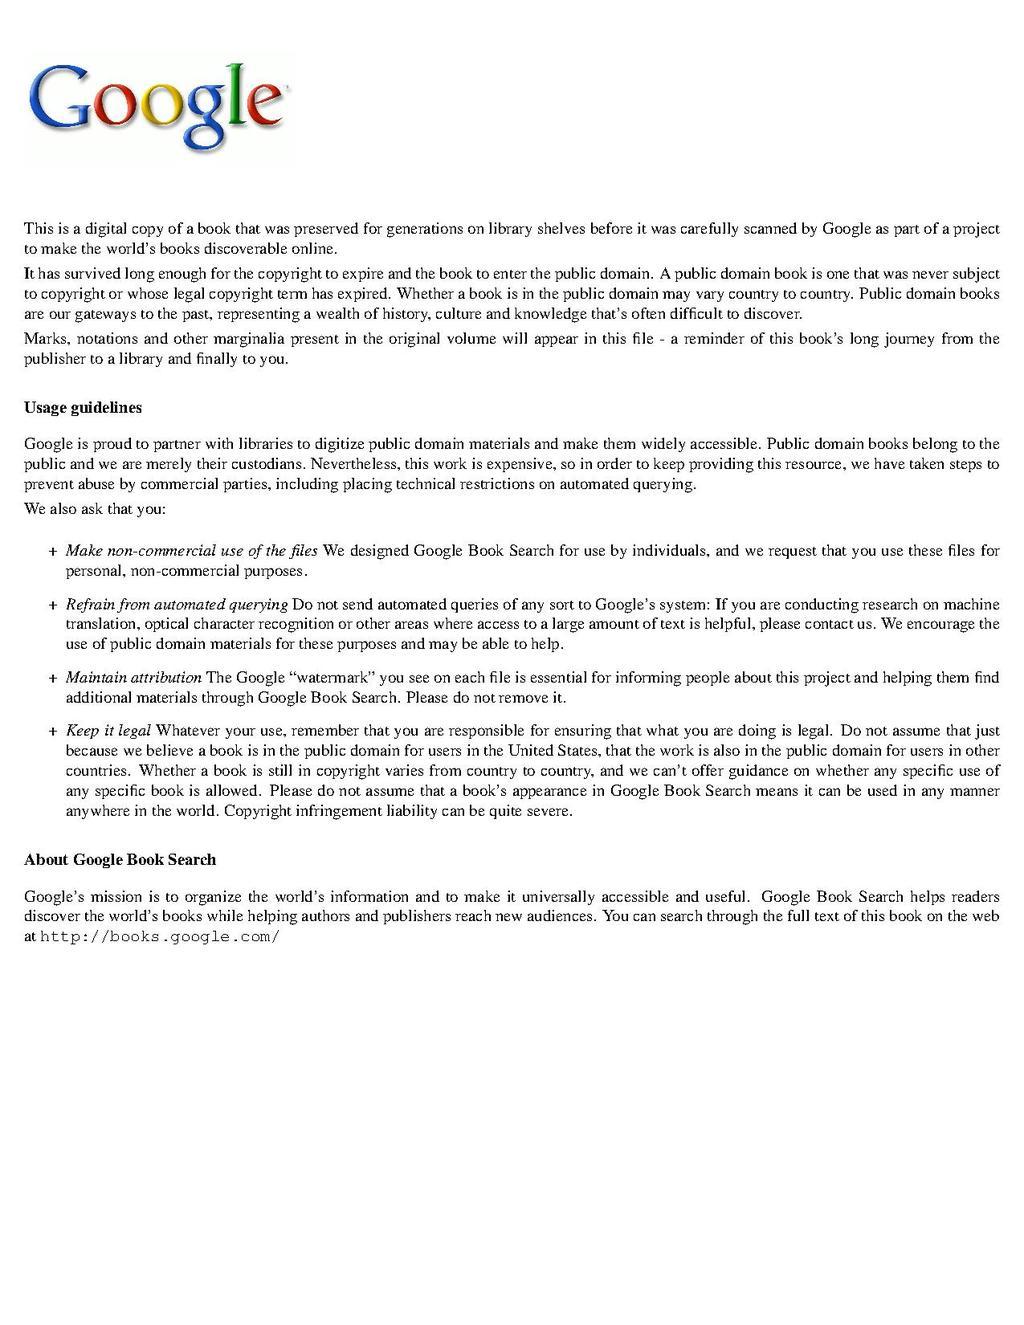 pagina s anselmi cantuariensis libri duo cur de pdf 1 wikisource